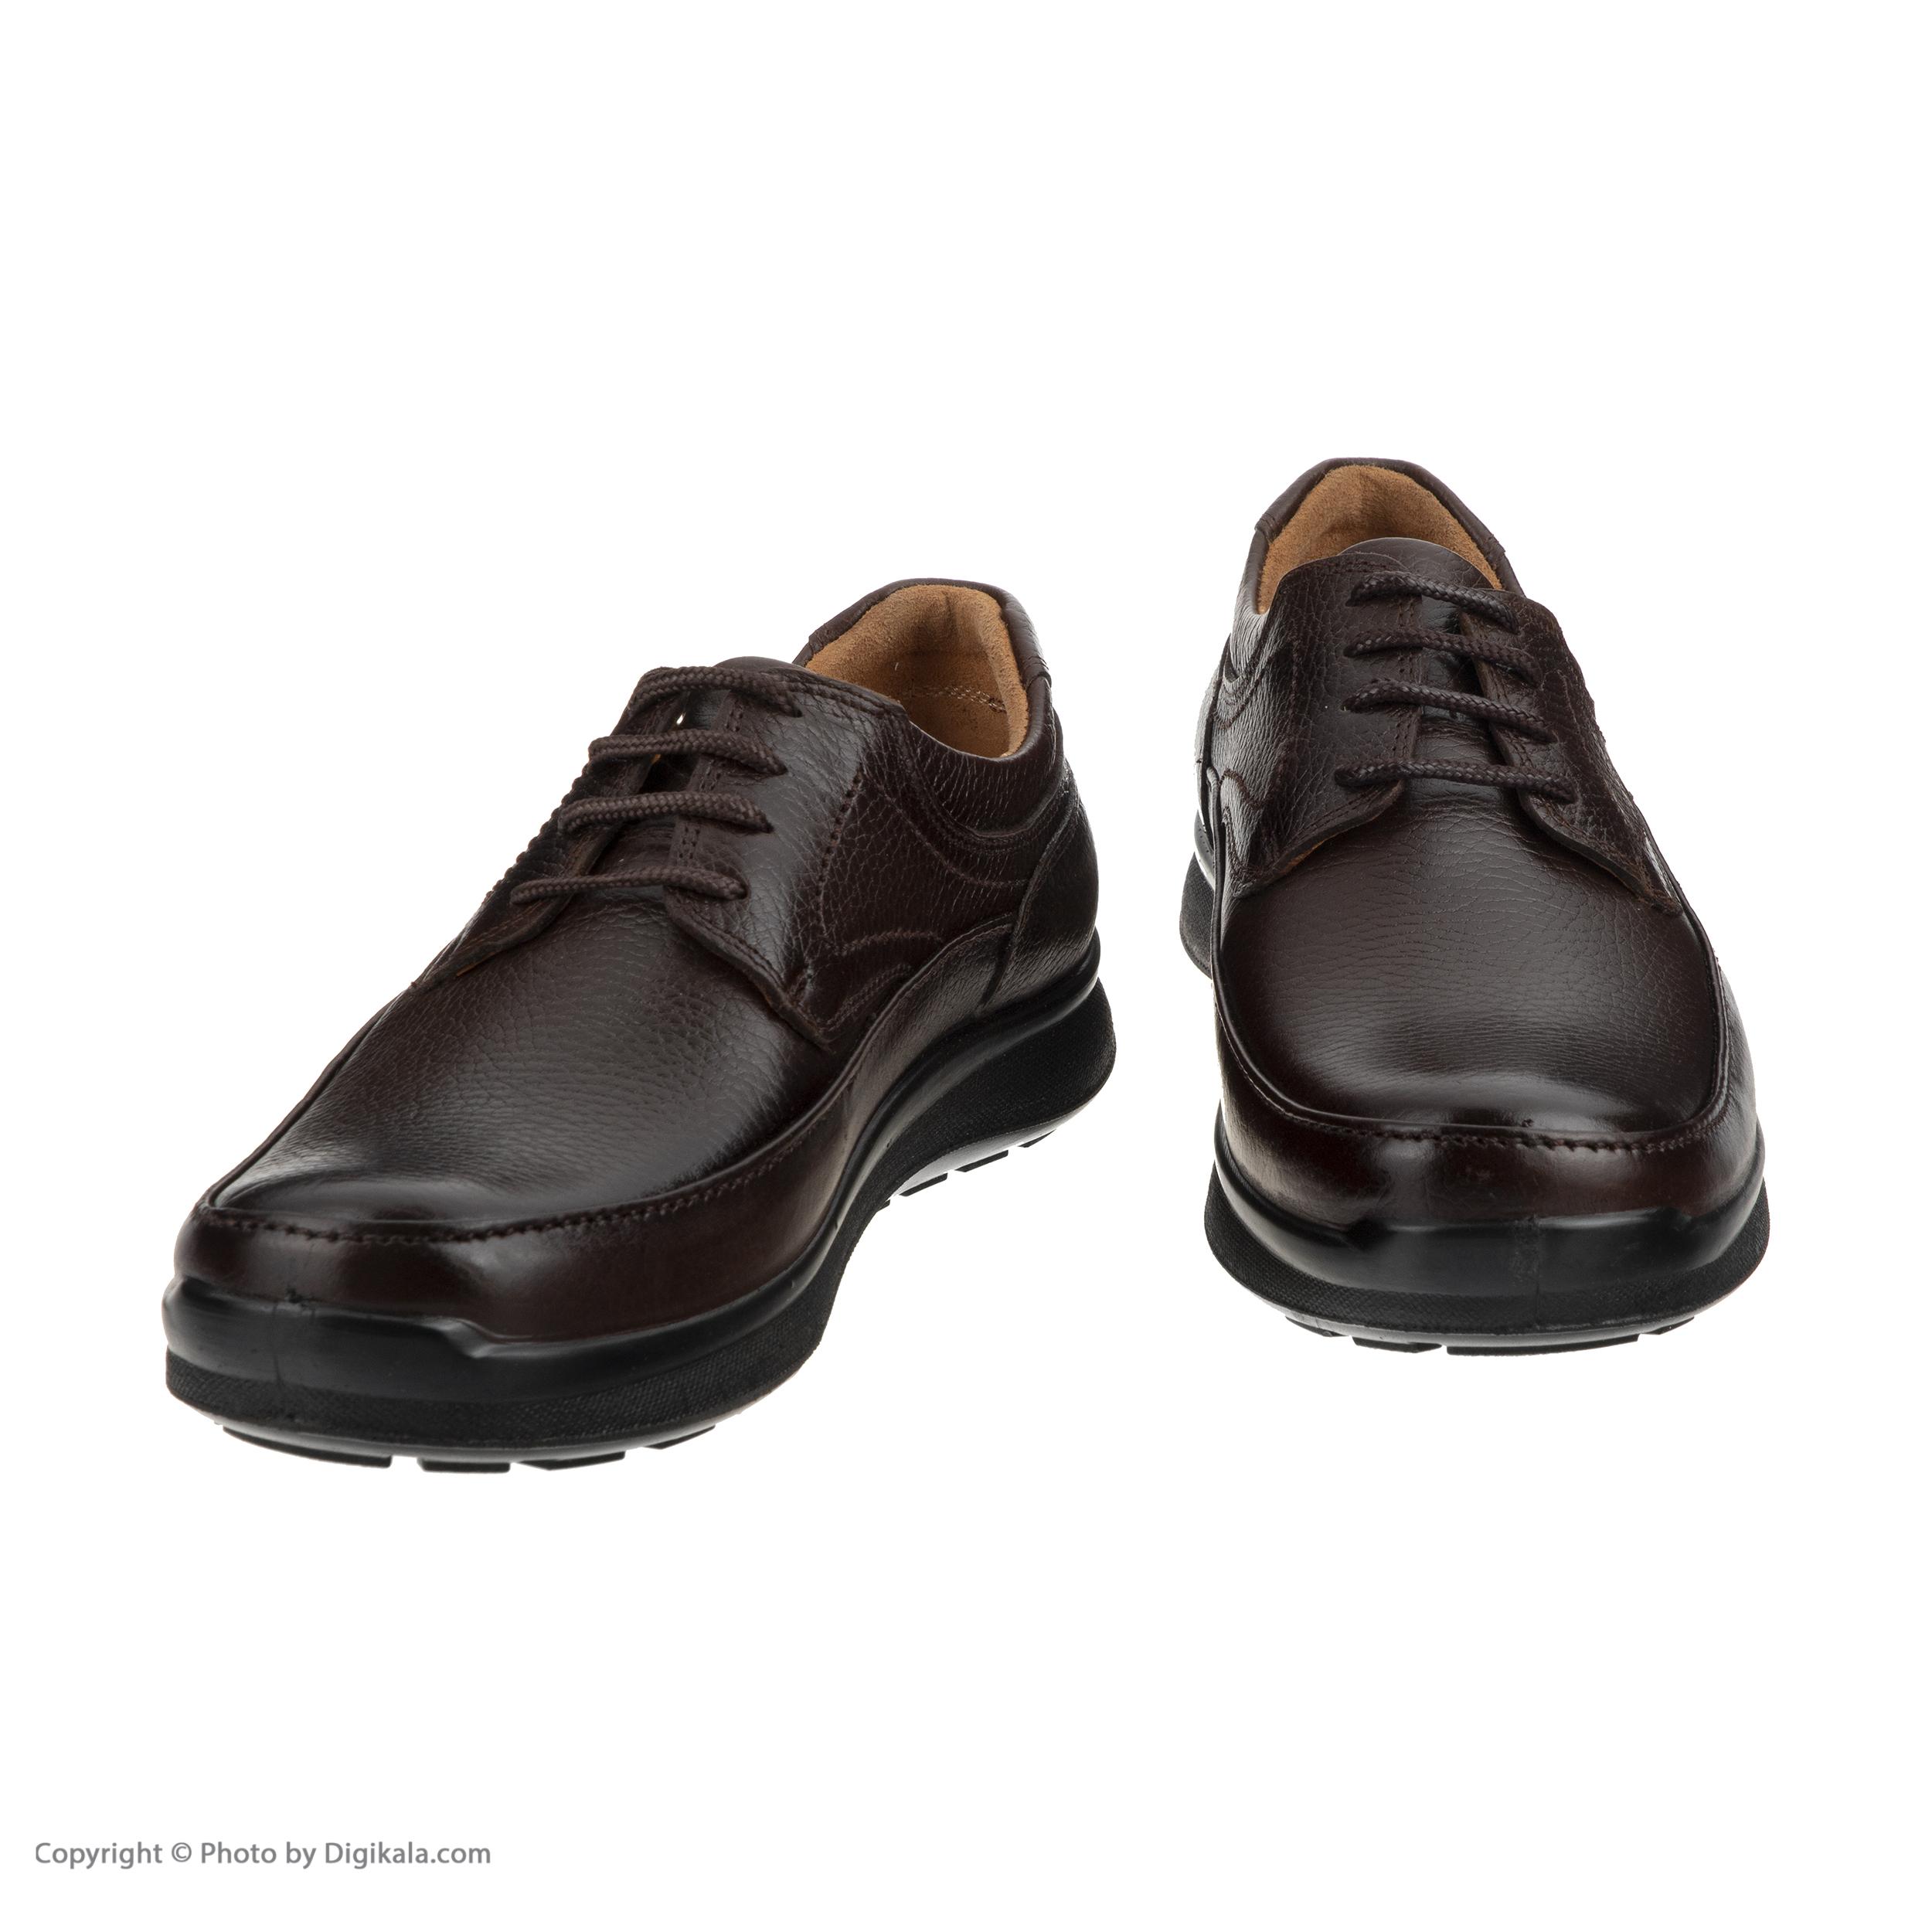 کفش روزمره مردانه بلوط مدل 7266C503104 -  - 4